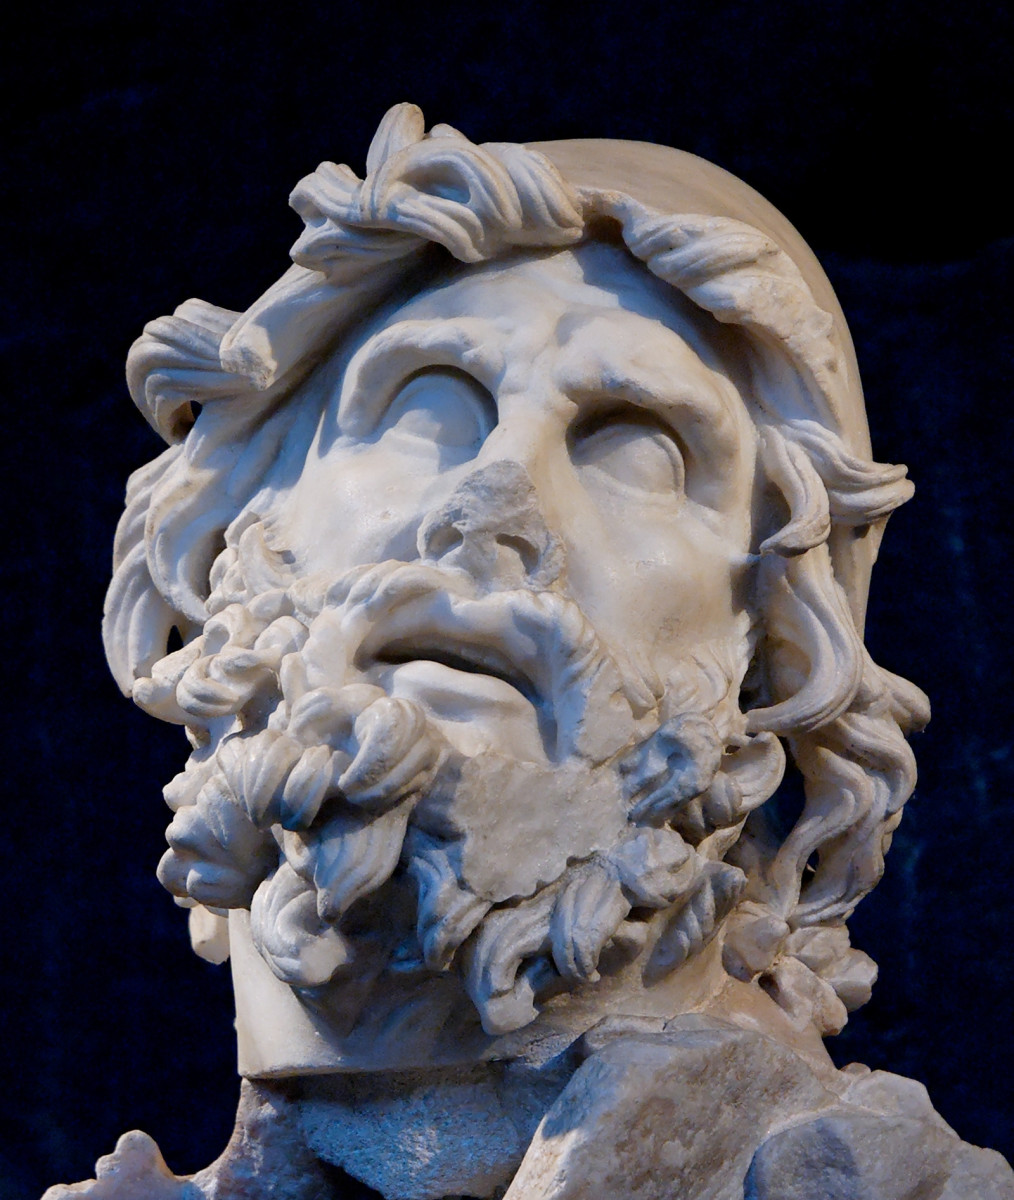 comparison-of-ram-and-odysseus